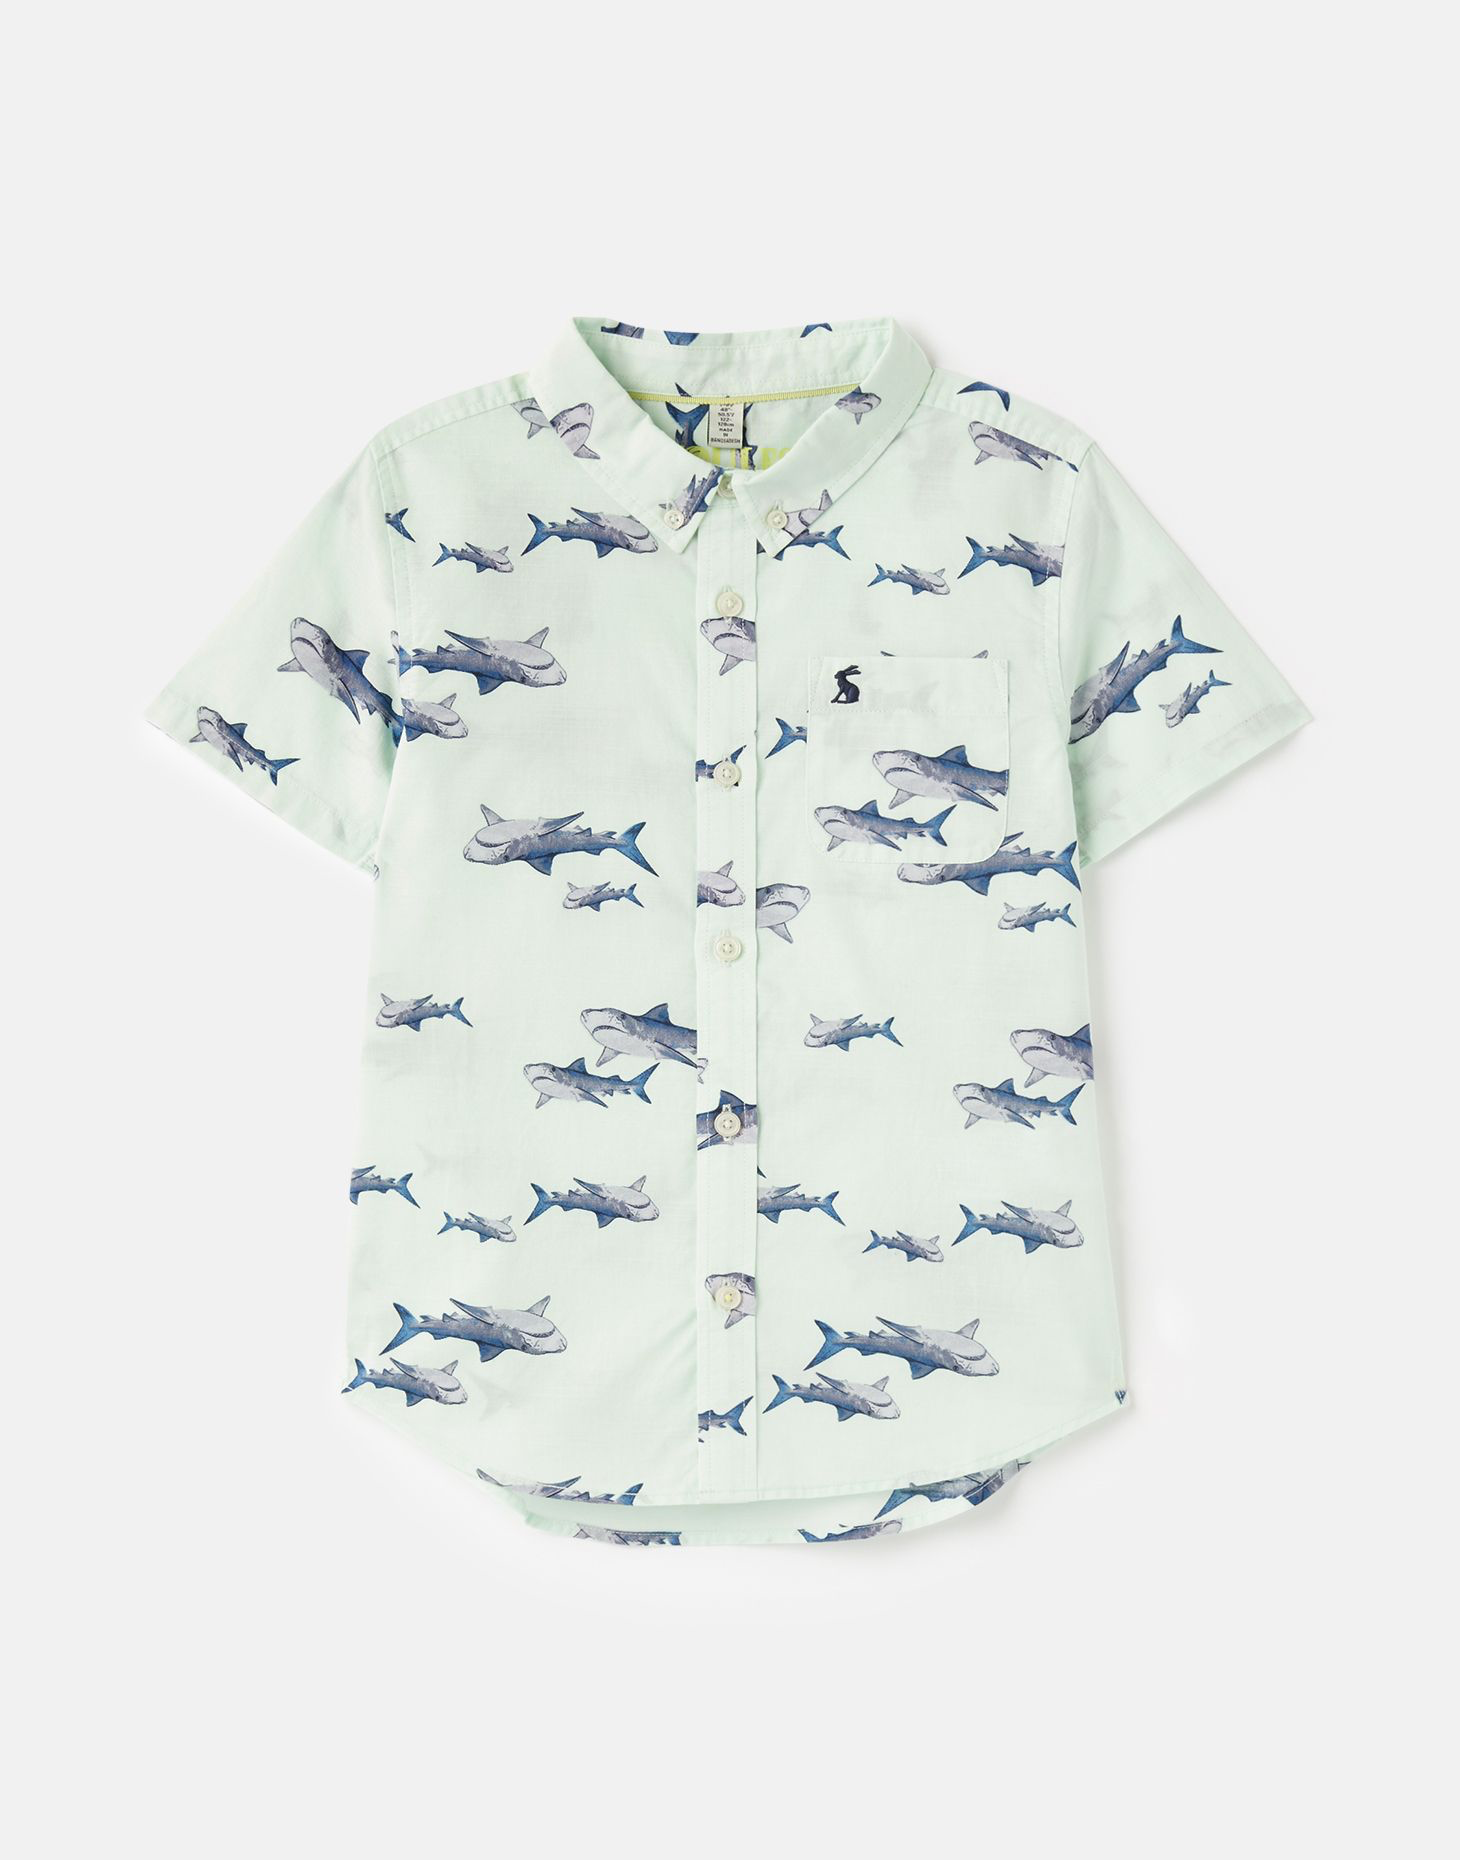 Joules Joules Shark Print Shirt